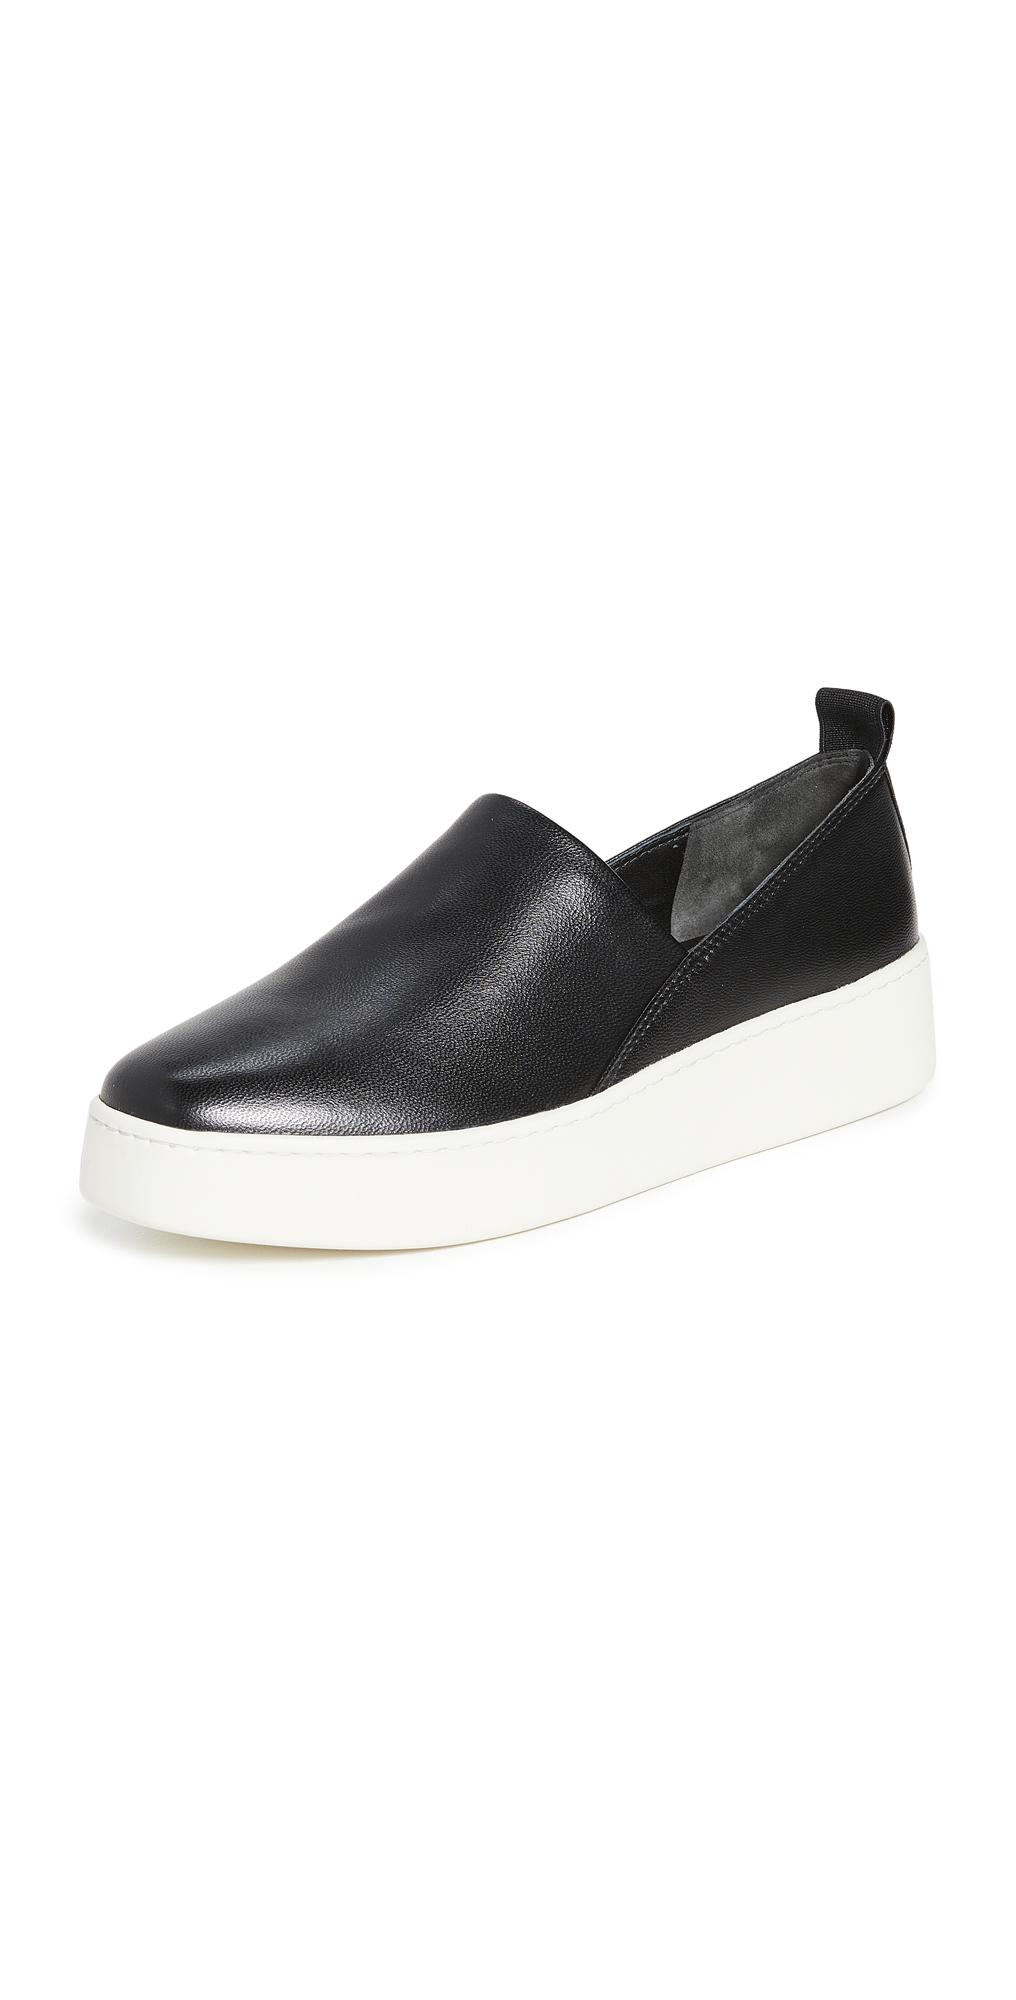 Vince Saxon 2 Slip On Sneakers